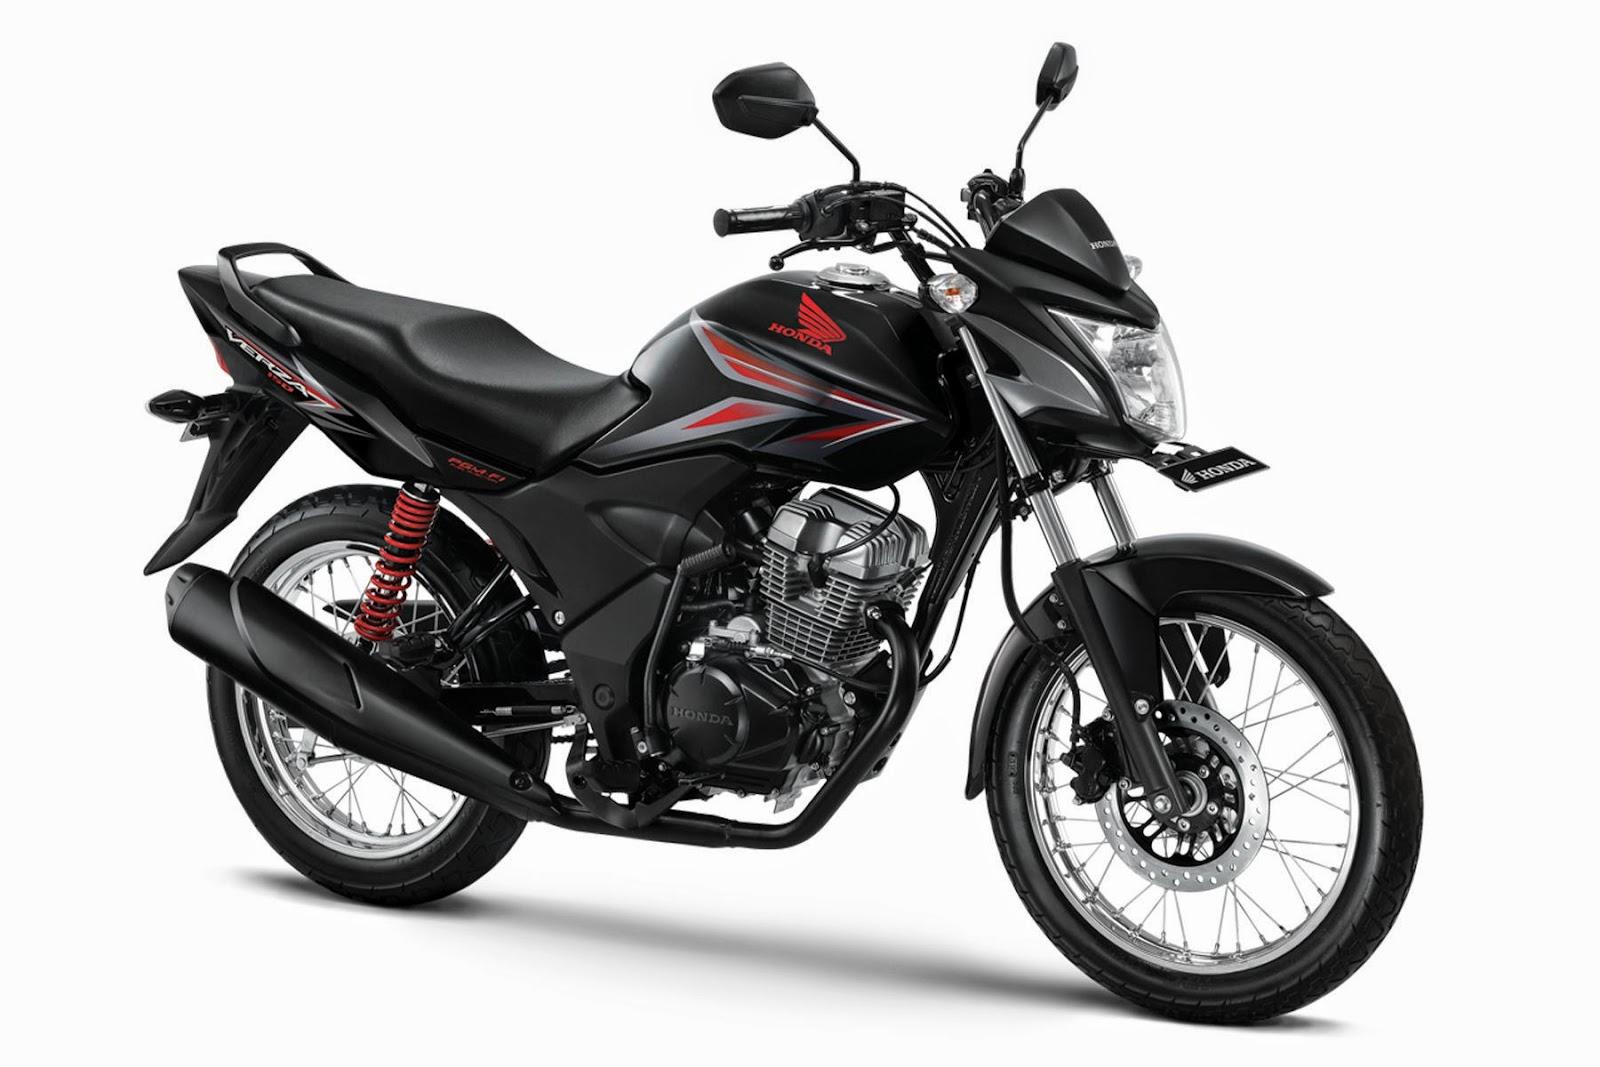 Harga motor 2015 harga honda verza 150 for Honda classic 2018